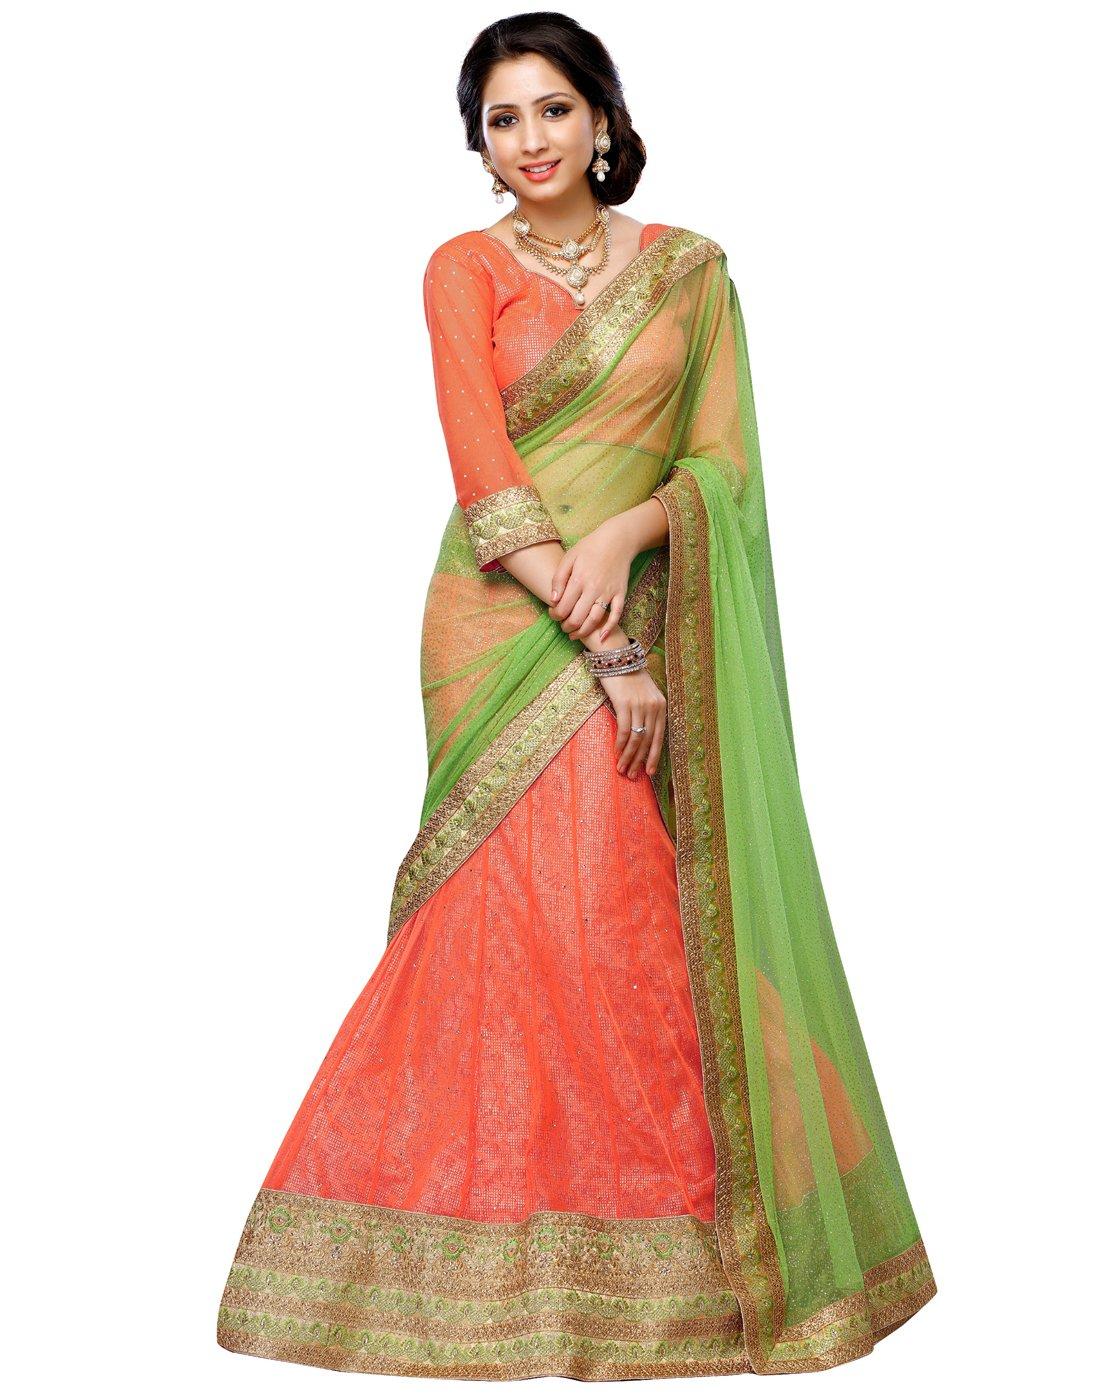 DesiButik's Wedding Wear Pleasant Orange Soft Net Lehenga